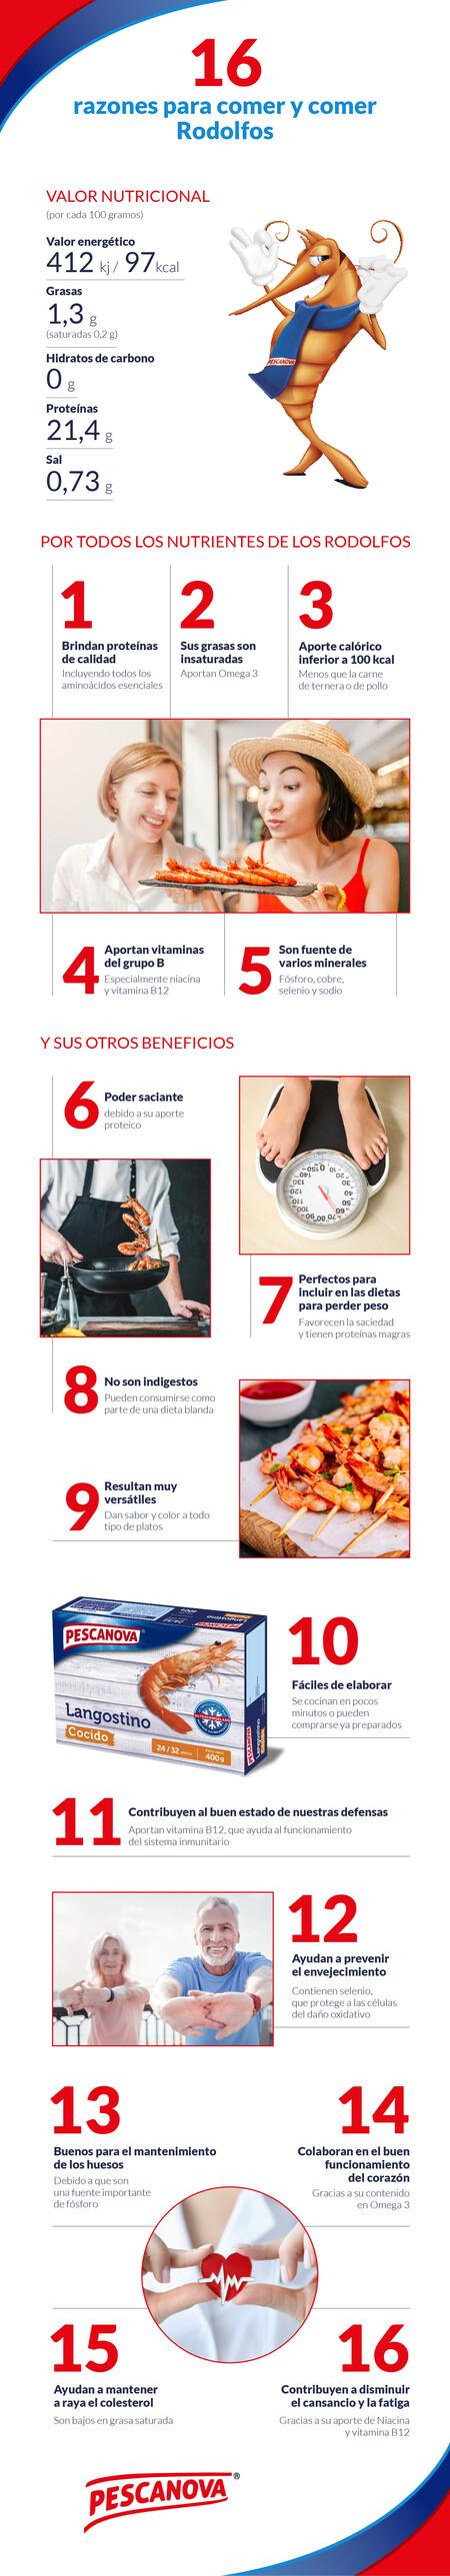 Pescanova Infografia Vitonica